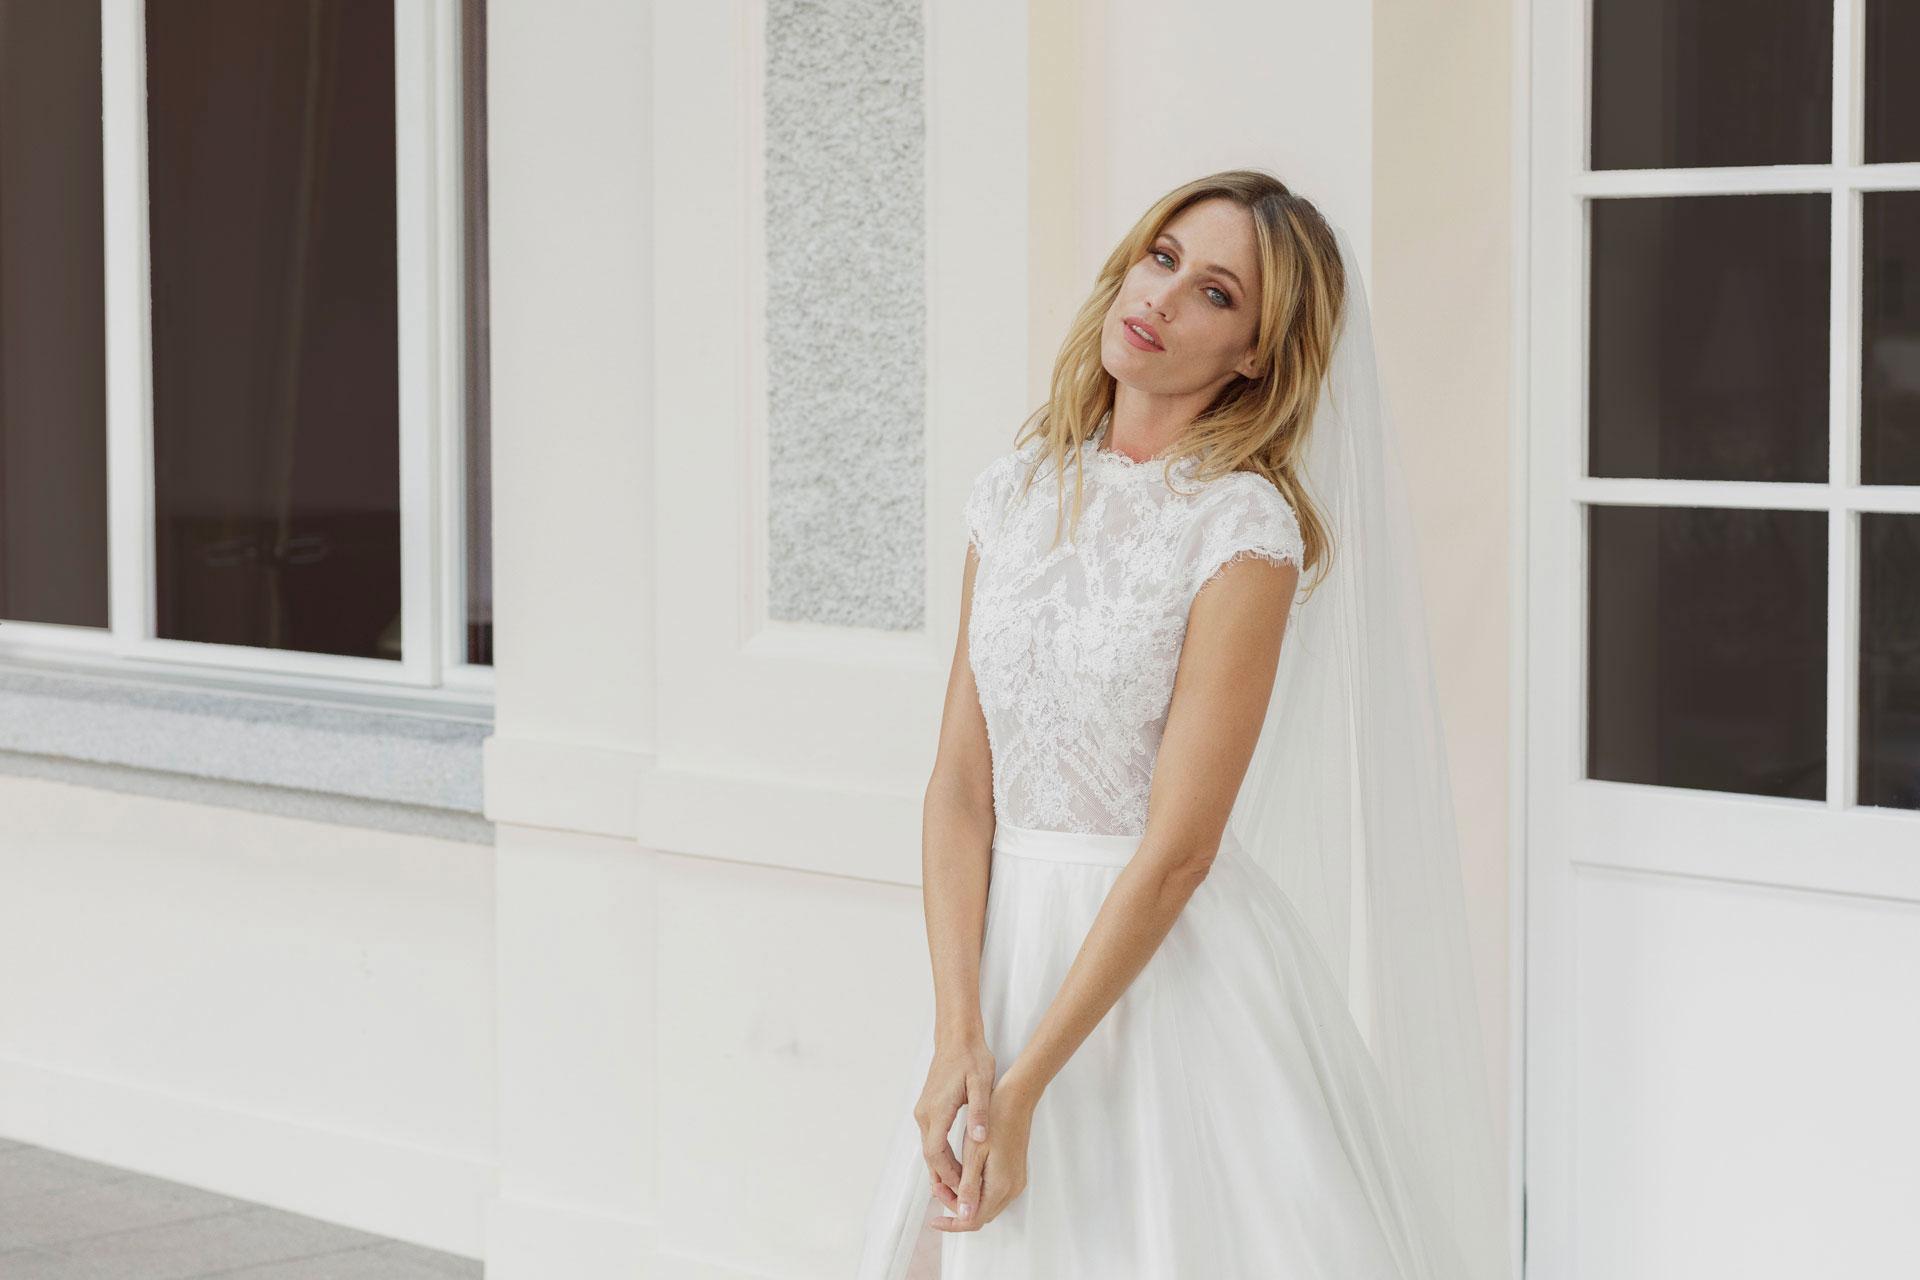 the latest b0c8e 0c1b2 Brautmode by Mery's Couture - Einzigartige Hochzeitskleider